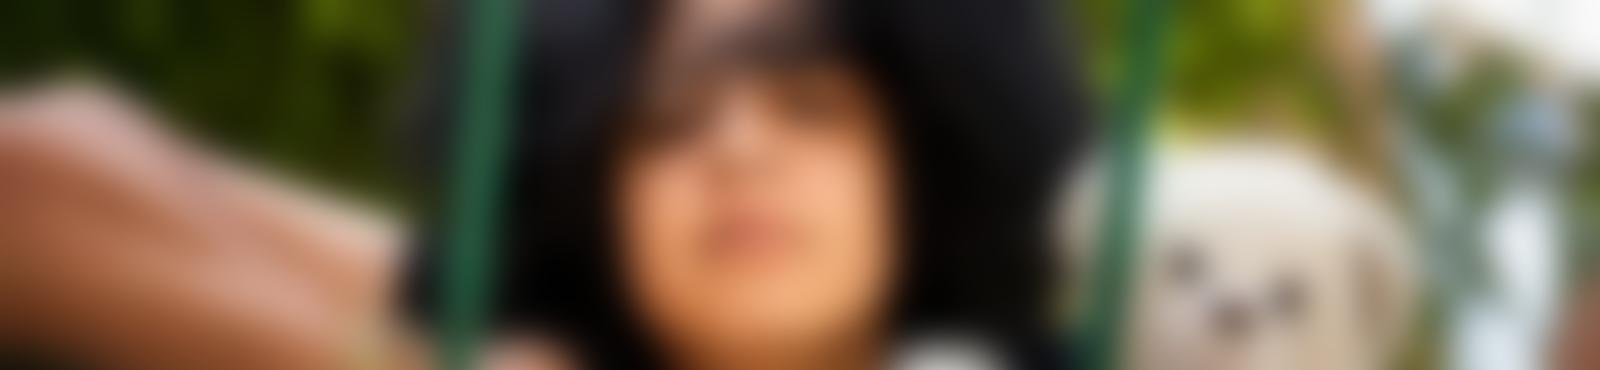 Blurred 38d5892c 16fc 4c2d a262 00512c7700f8